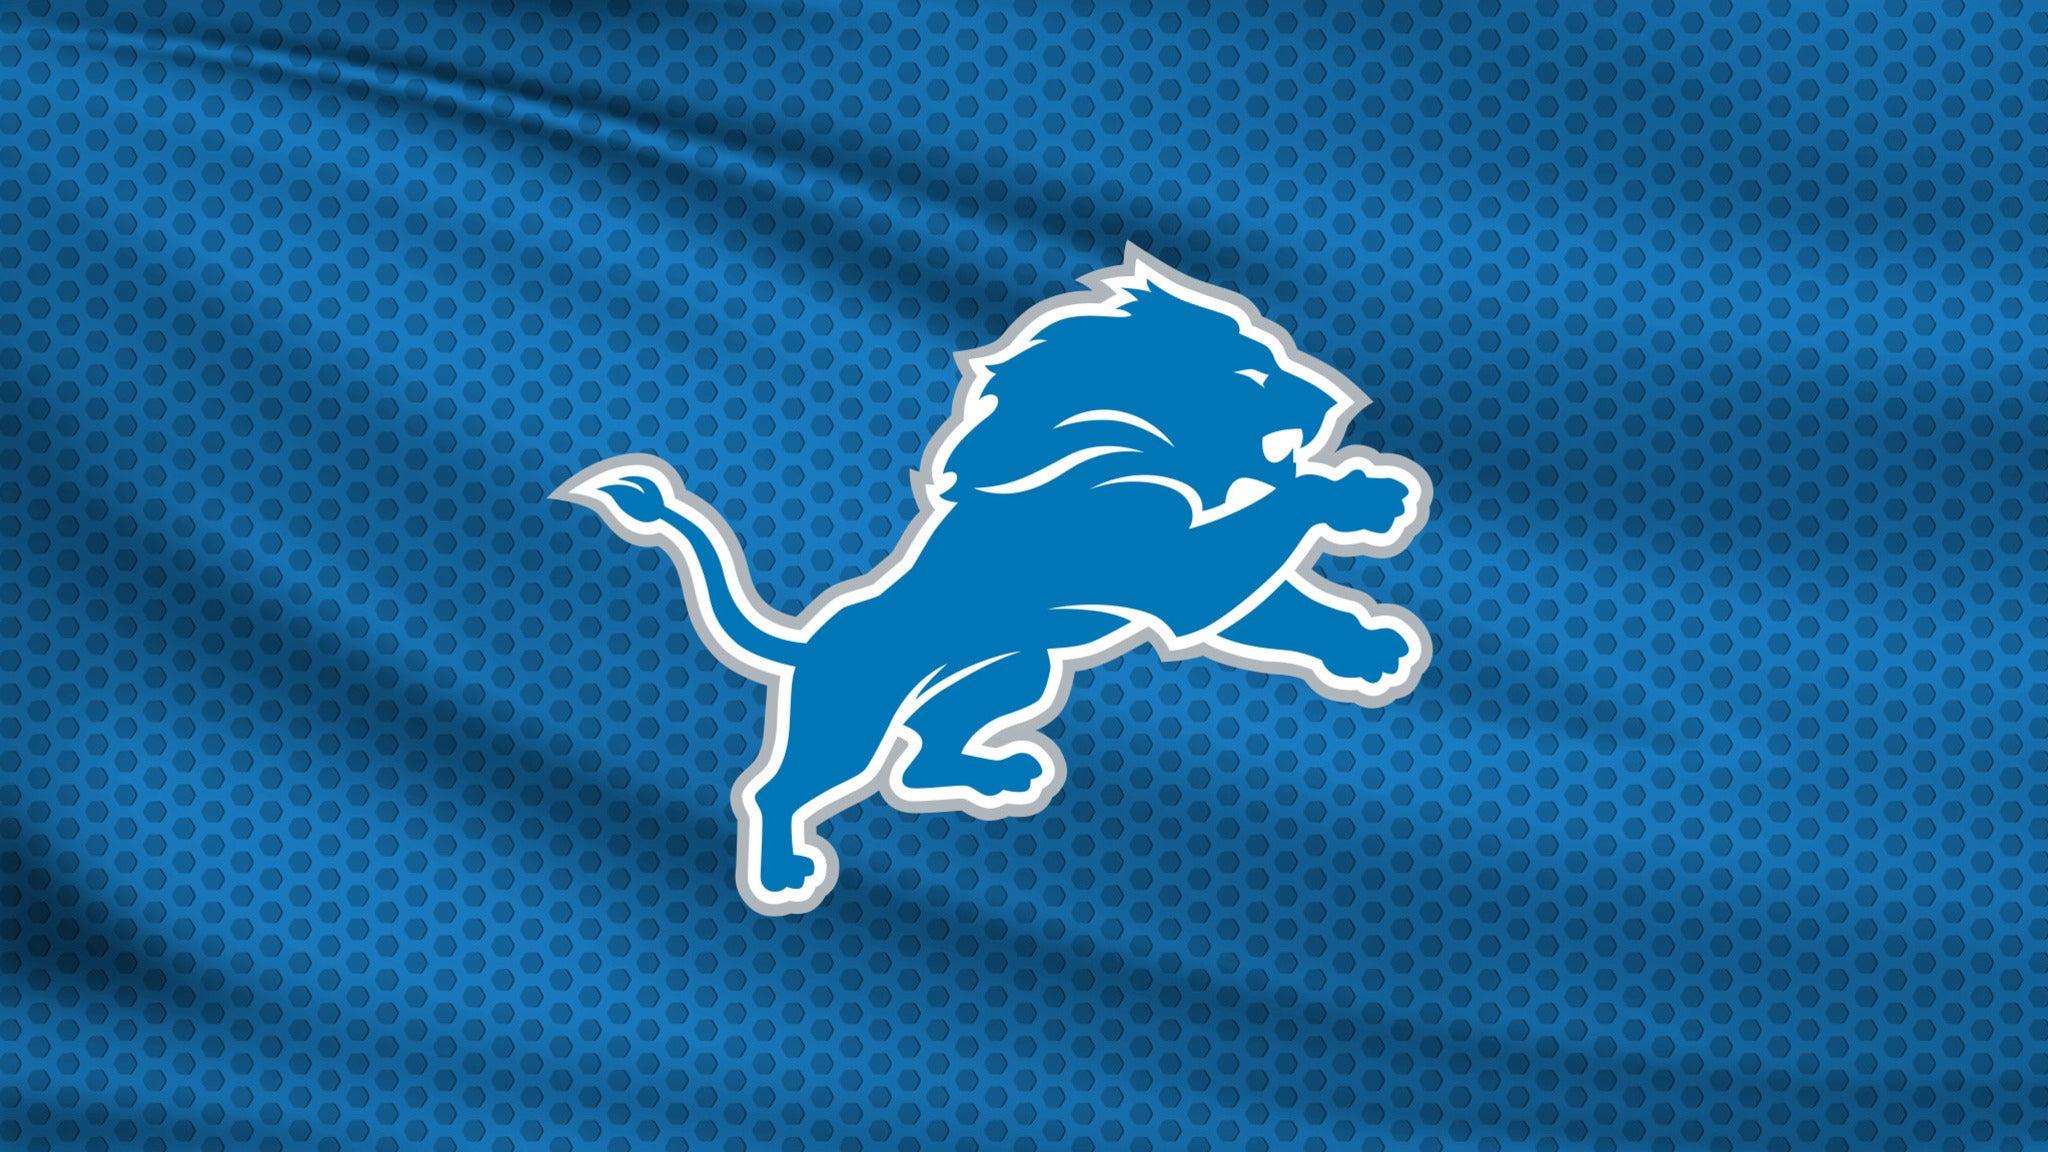 Detroit Lions vs. Philadelphia Eagles at Ford Field